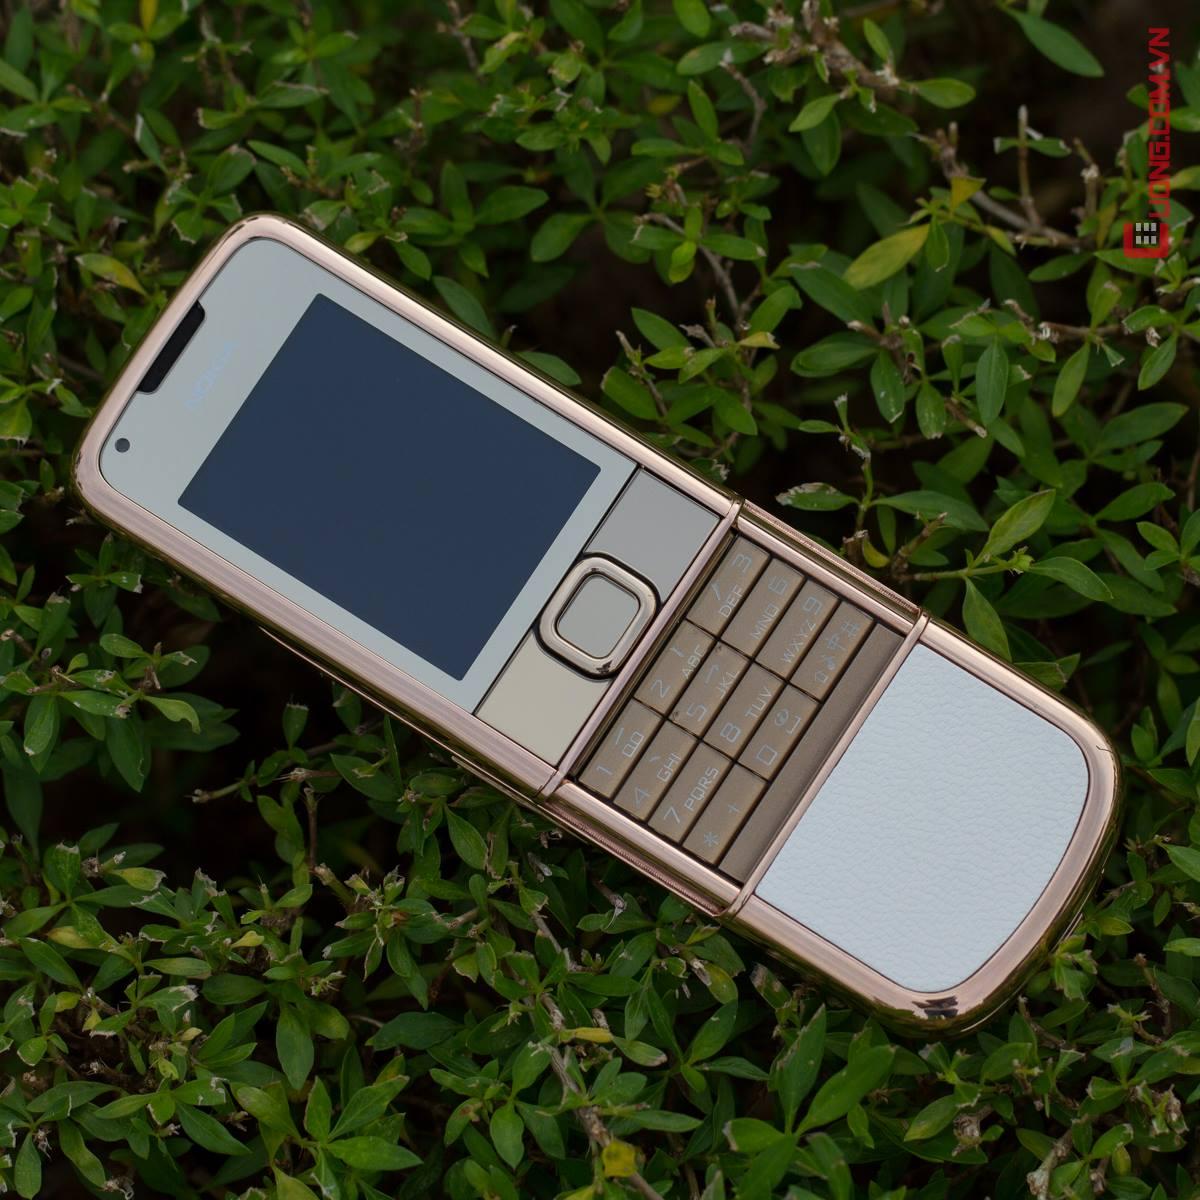 B�n ph�m tuy?t v?i c?a Nokia 8800 Gold Arte